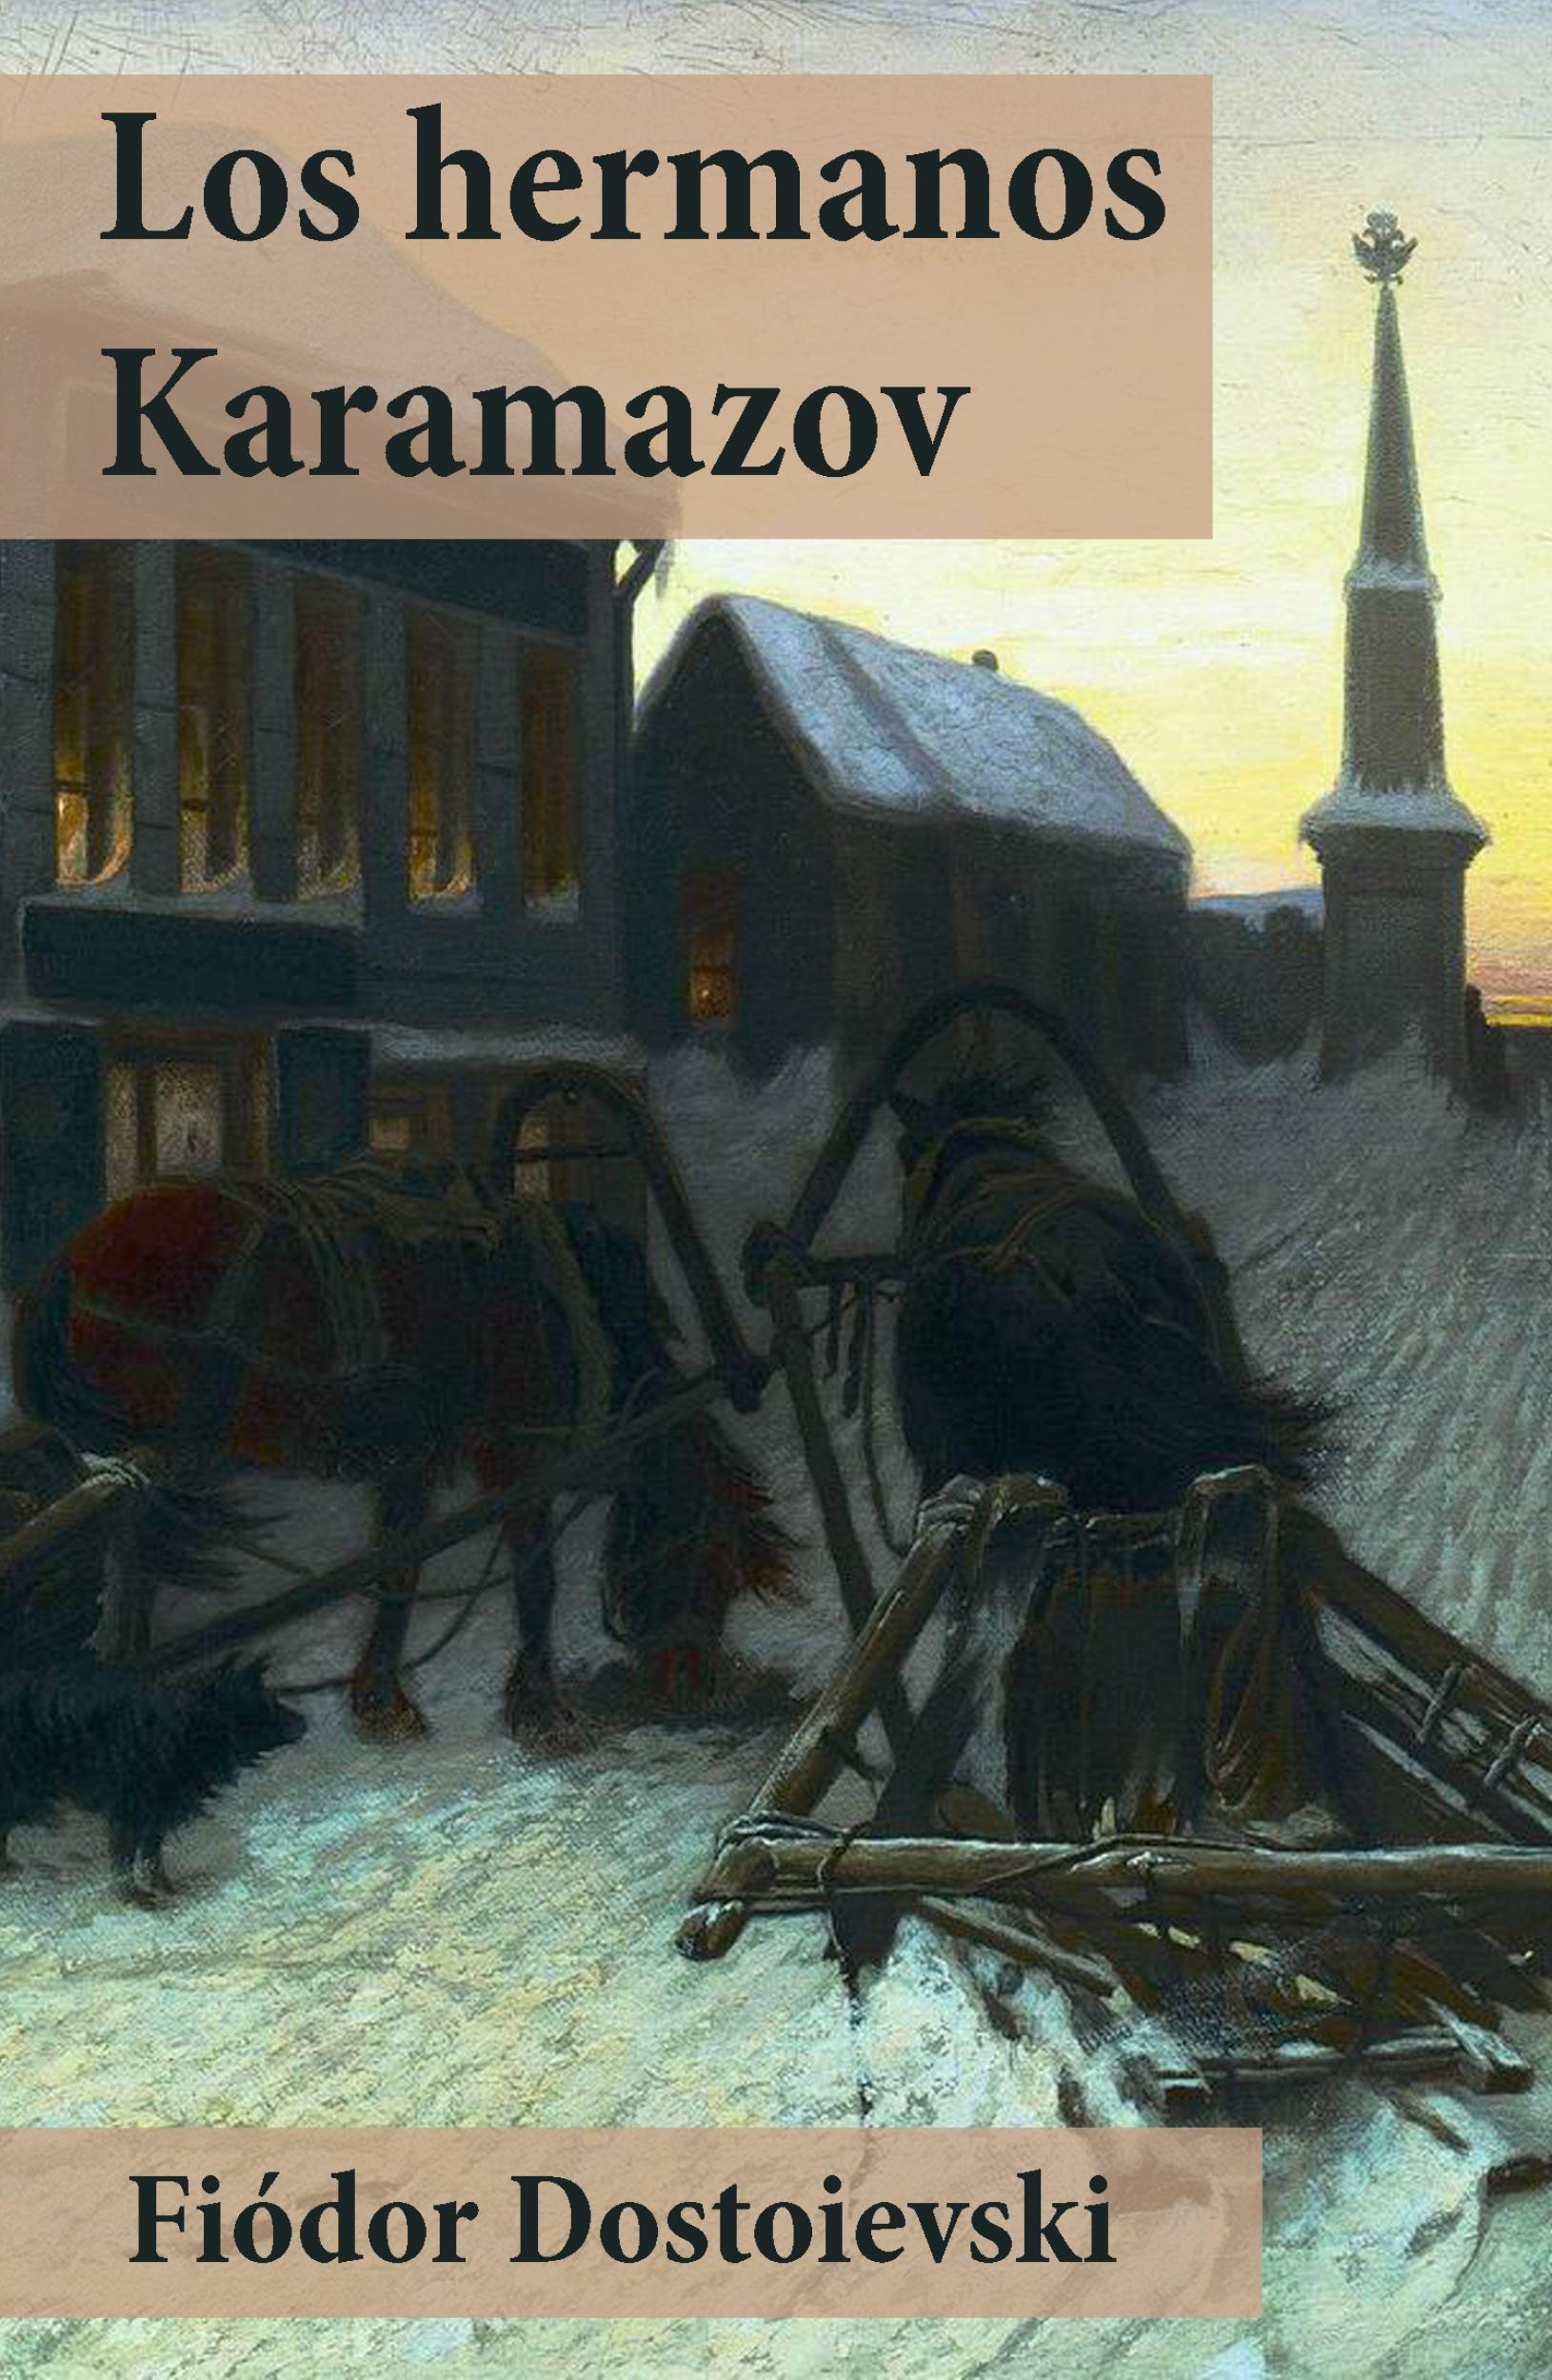 93. Los hermanos Karamazov